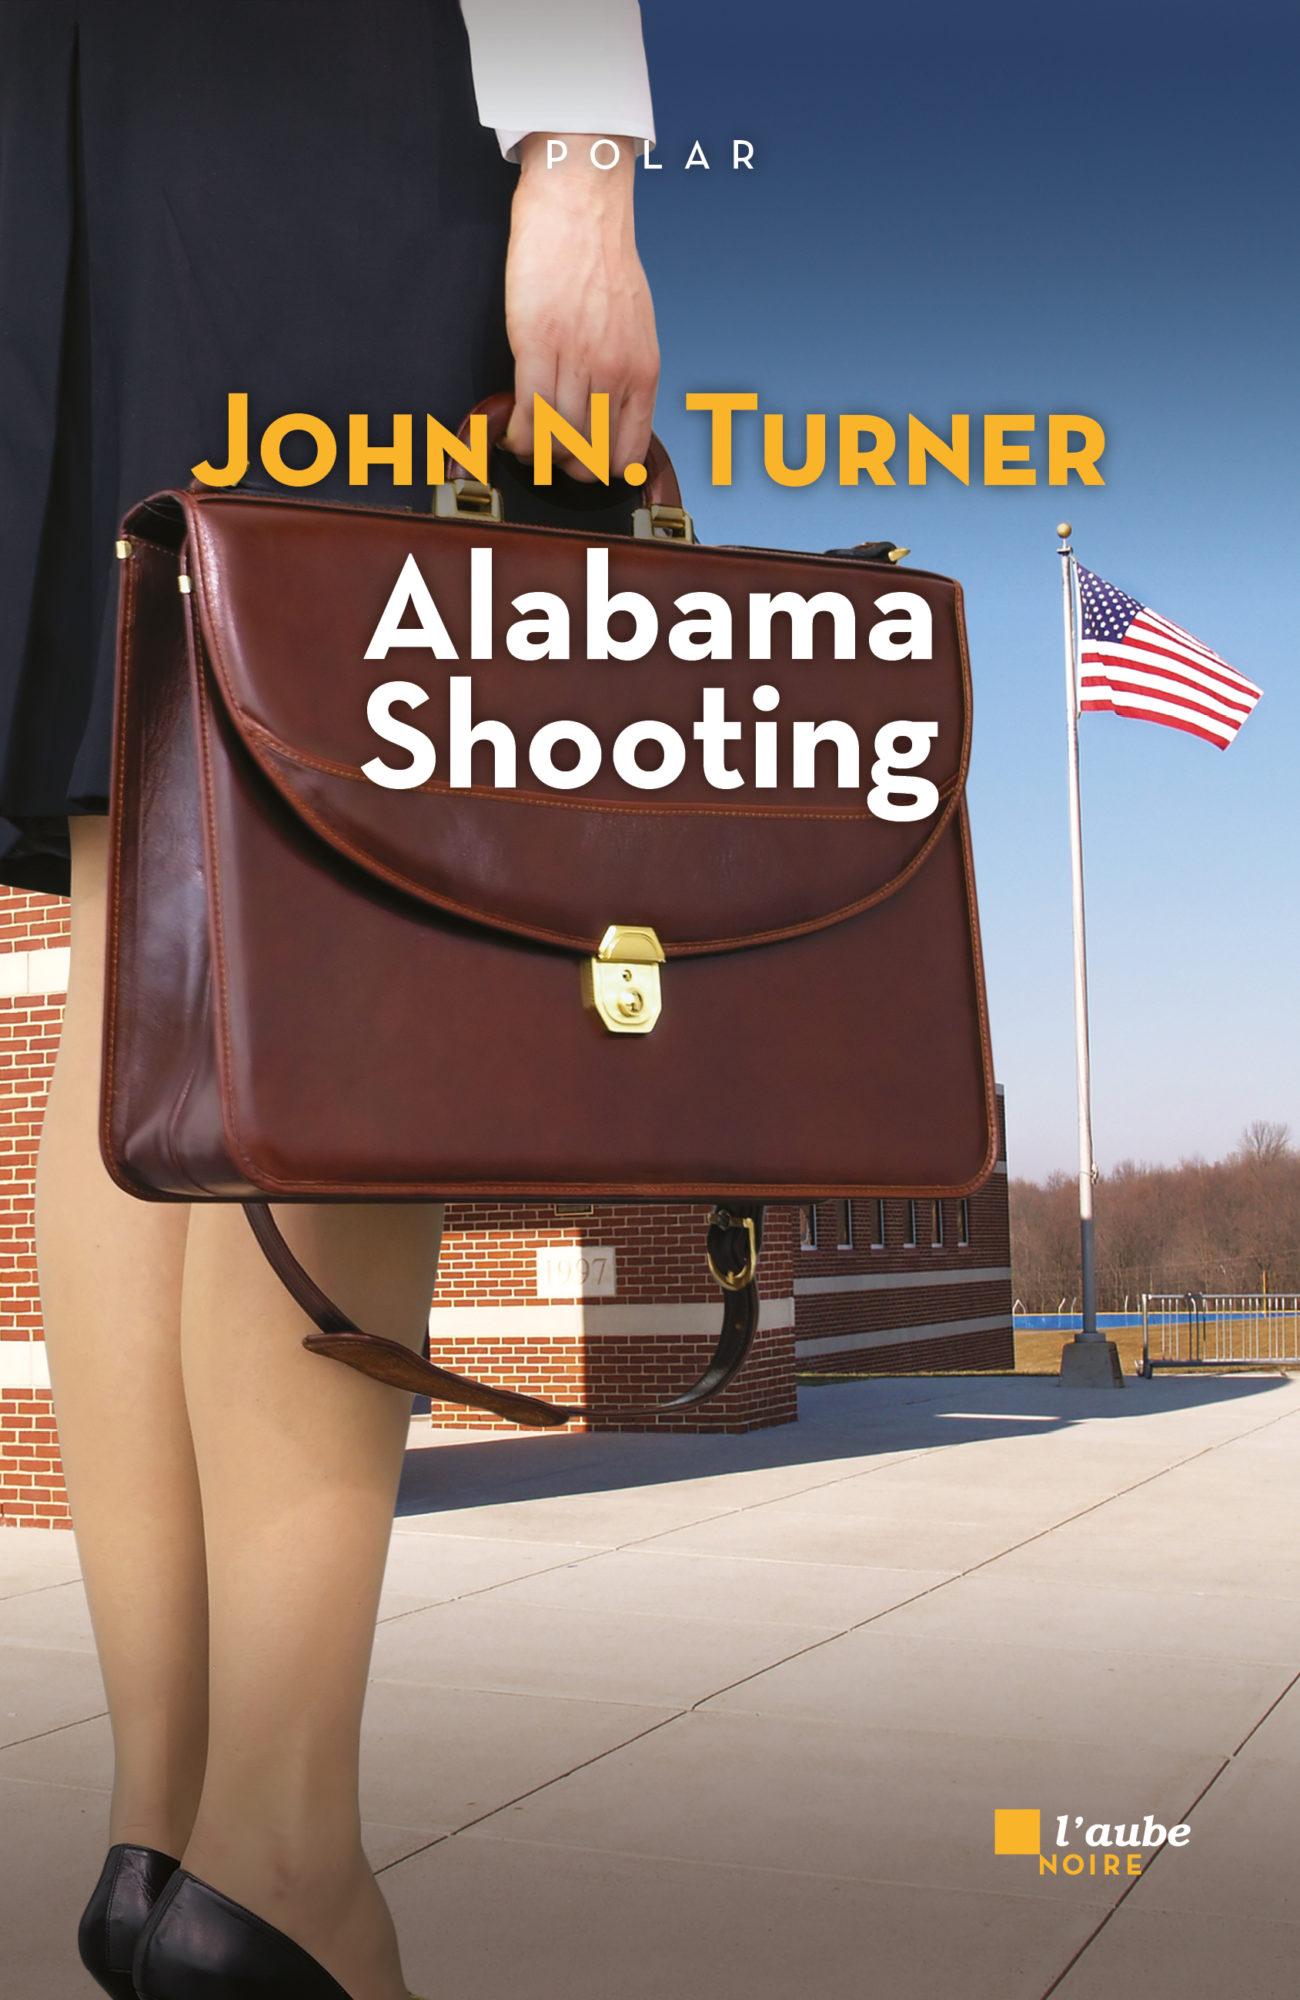 Alabama Shooting